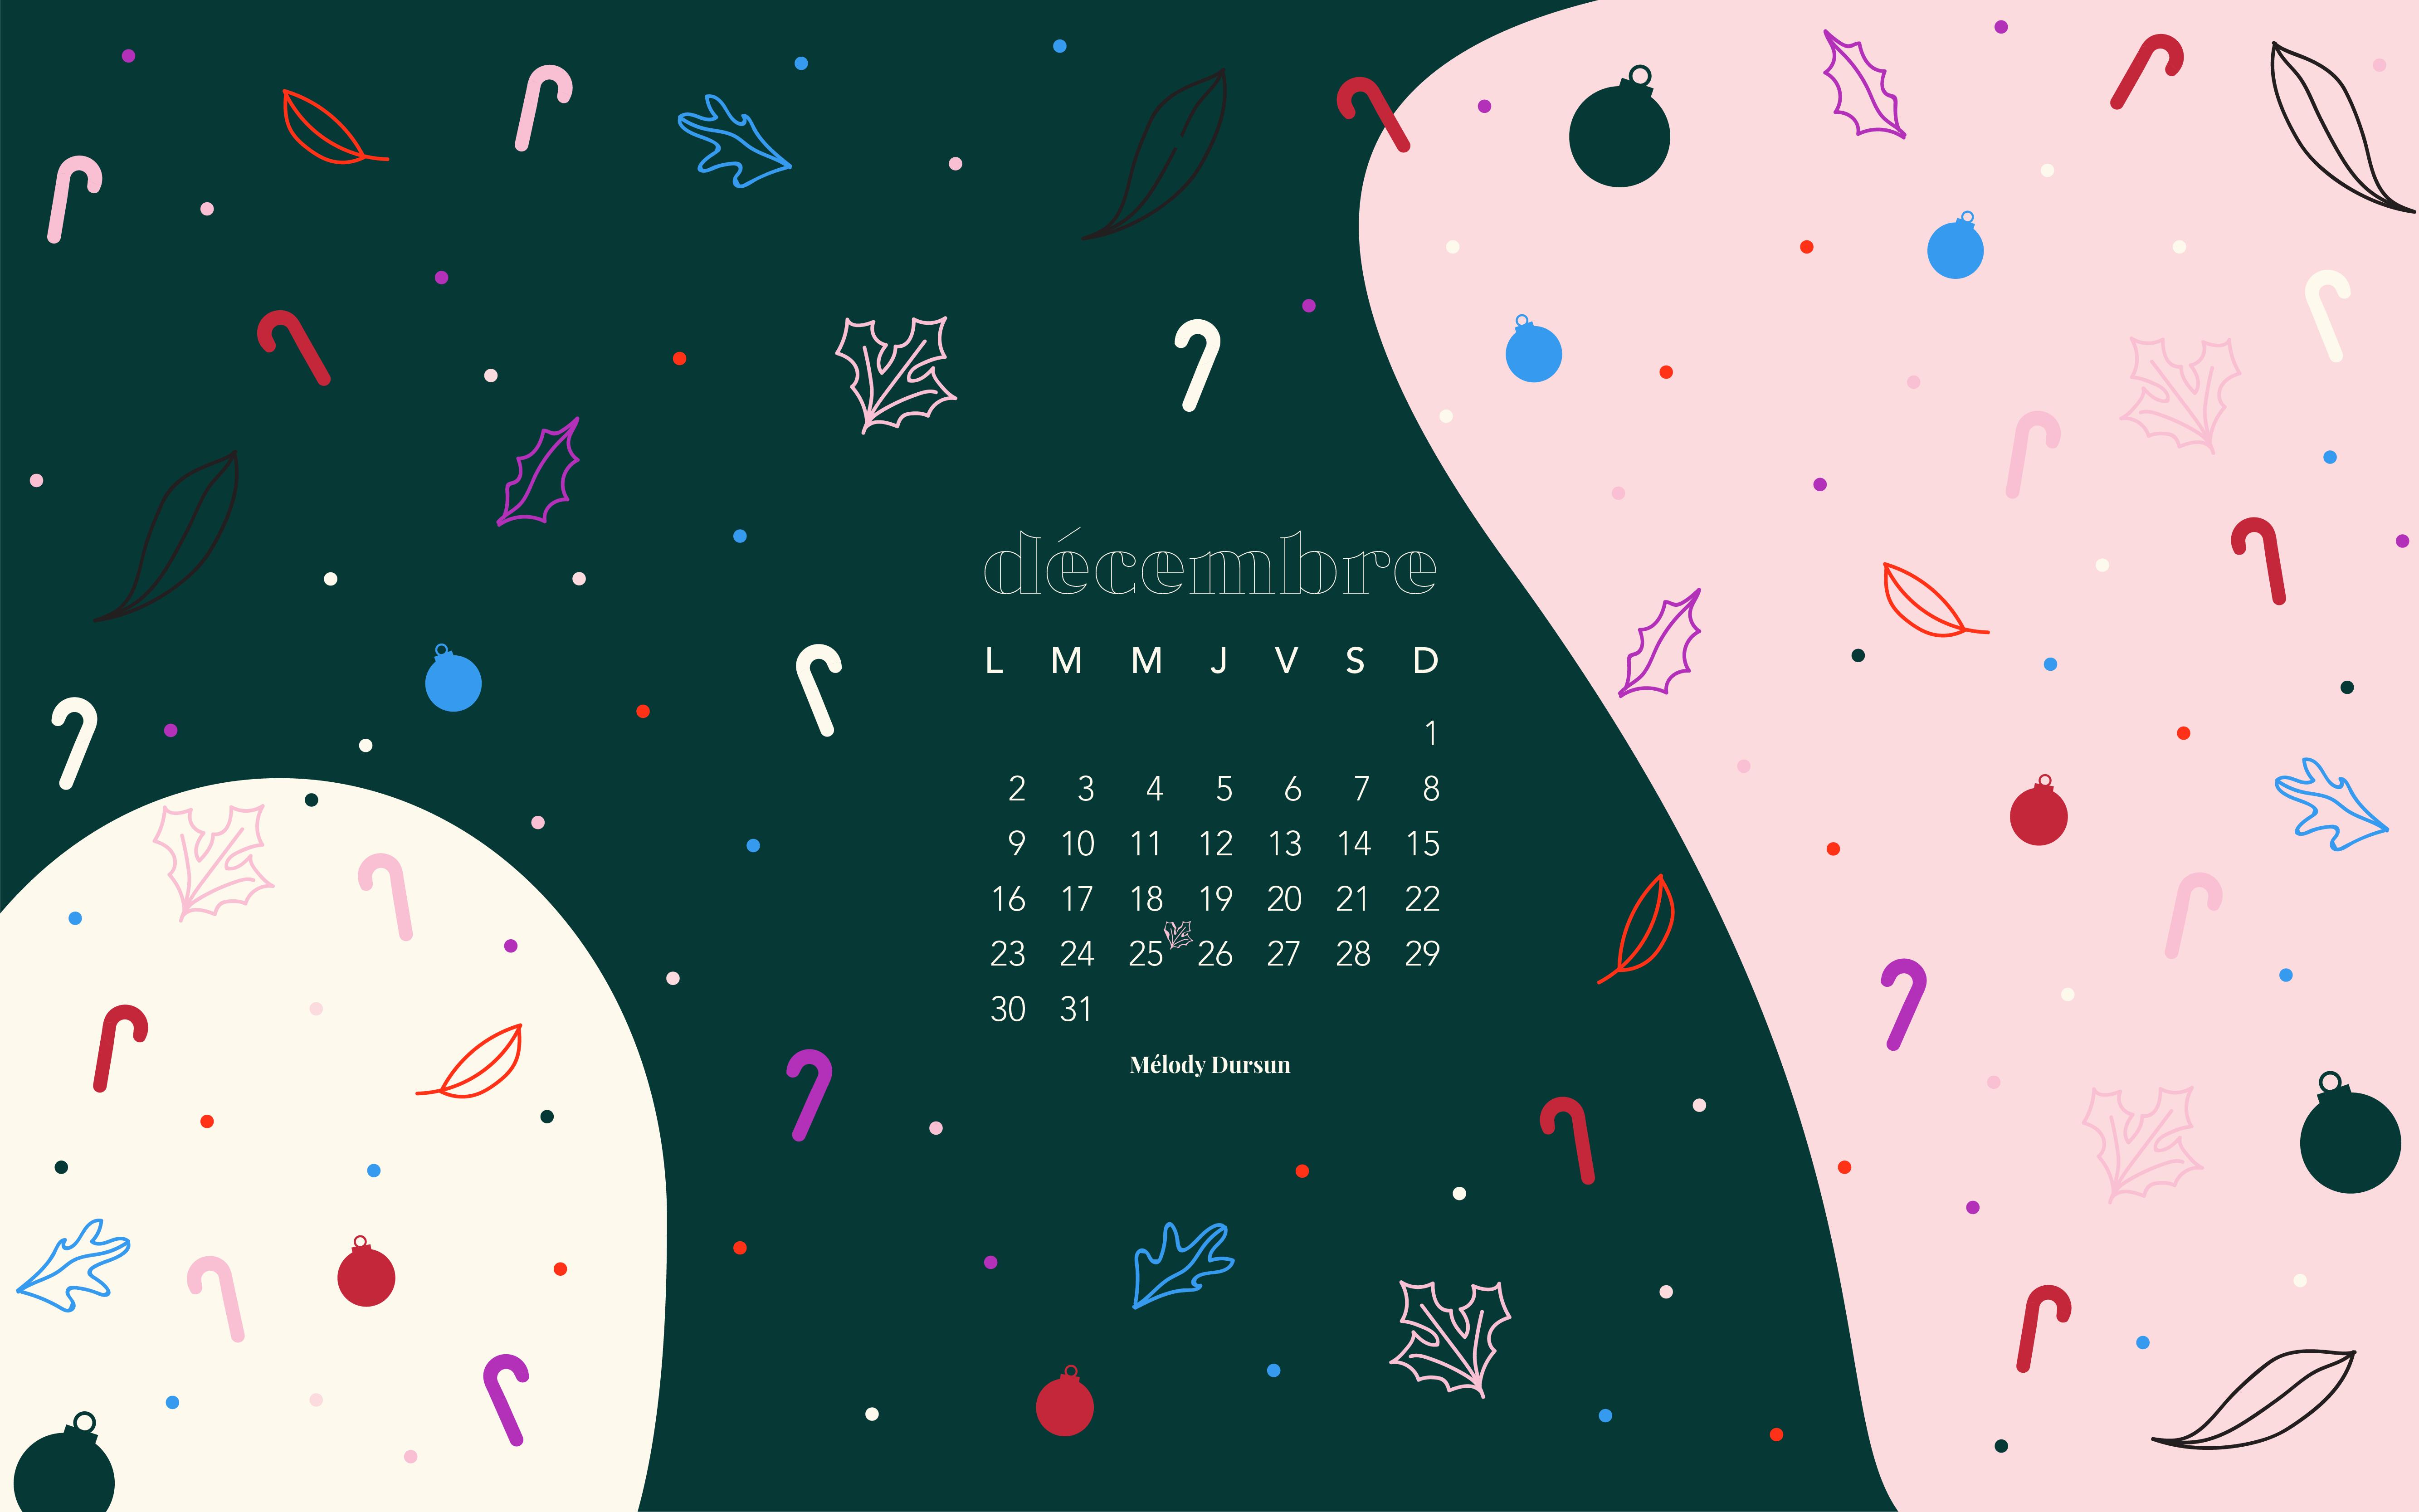 olecoeur-melodydursun-calendrier-decembre2019_Desktop